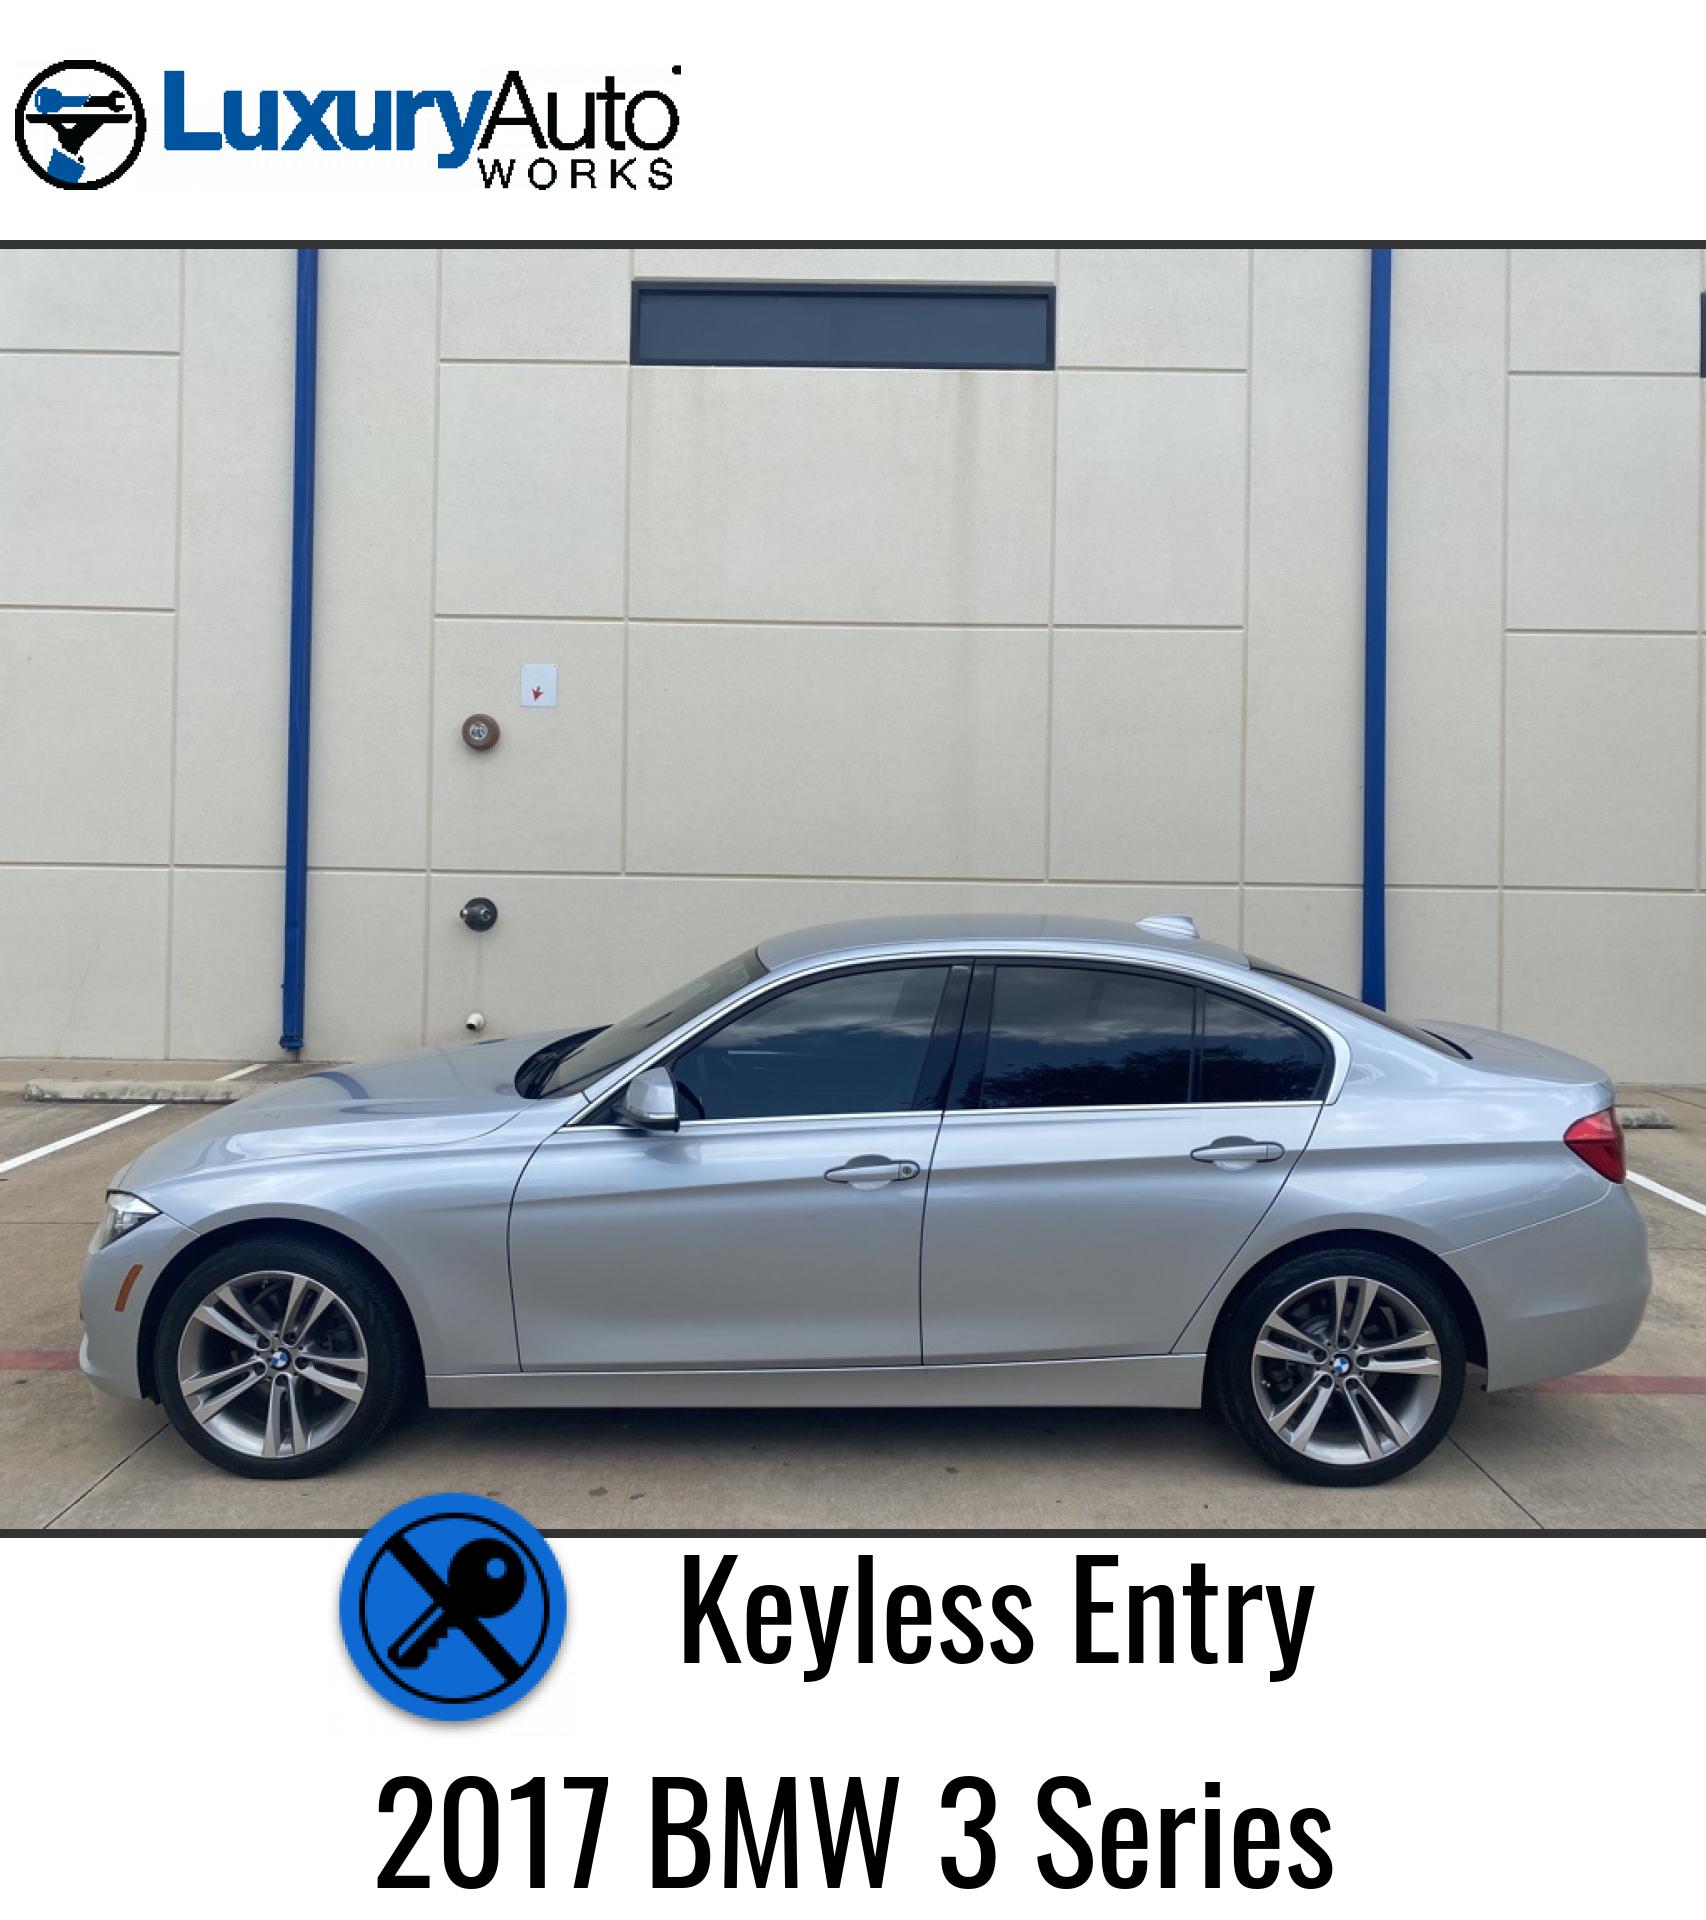 Pre-Owned 2017 BMW 3 Series 330i xDrive